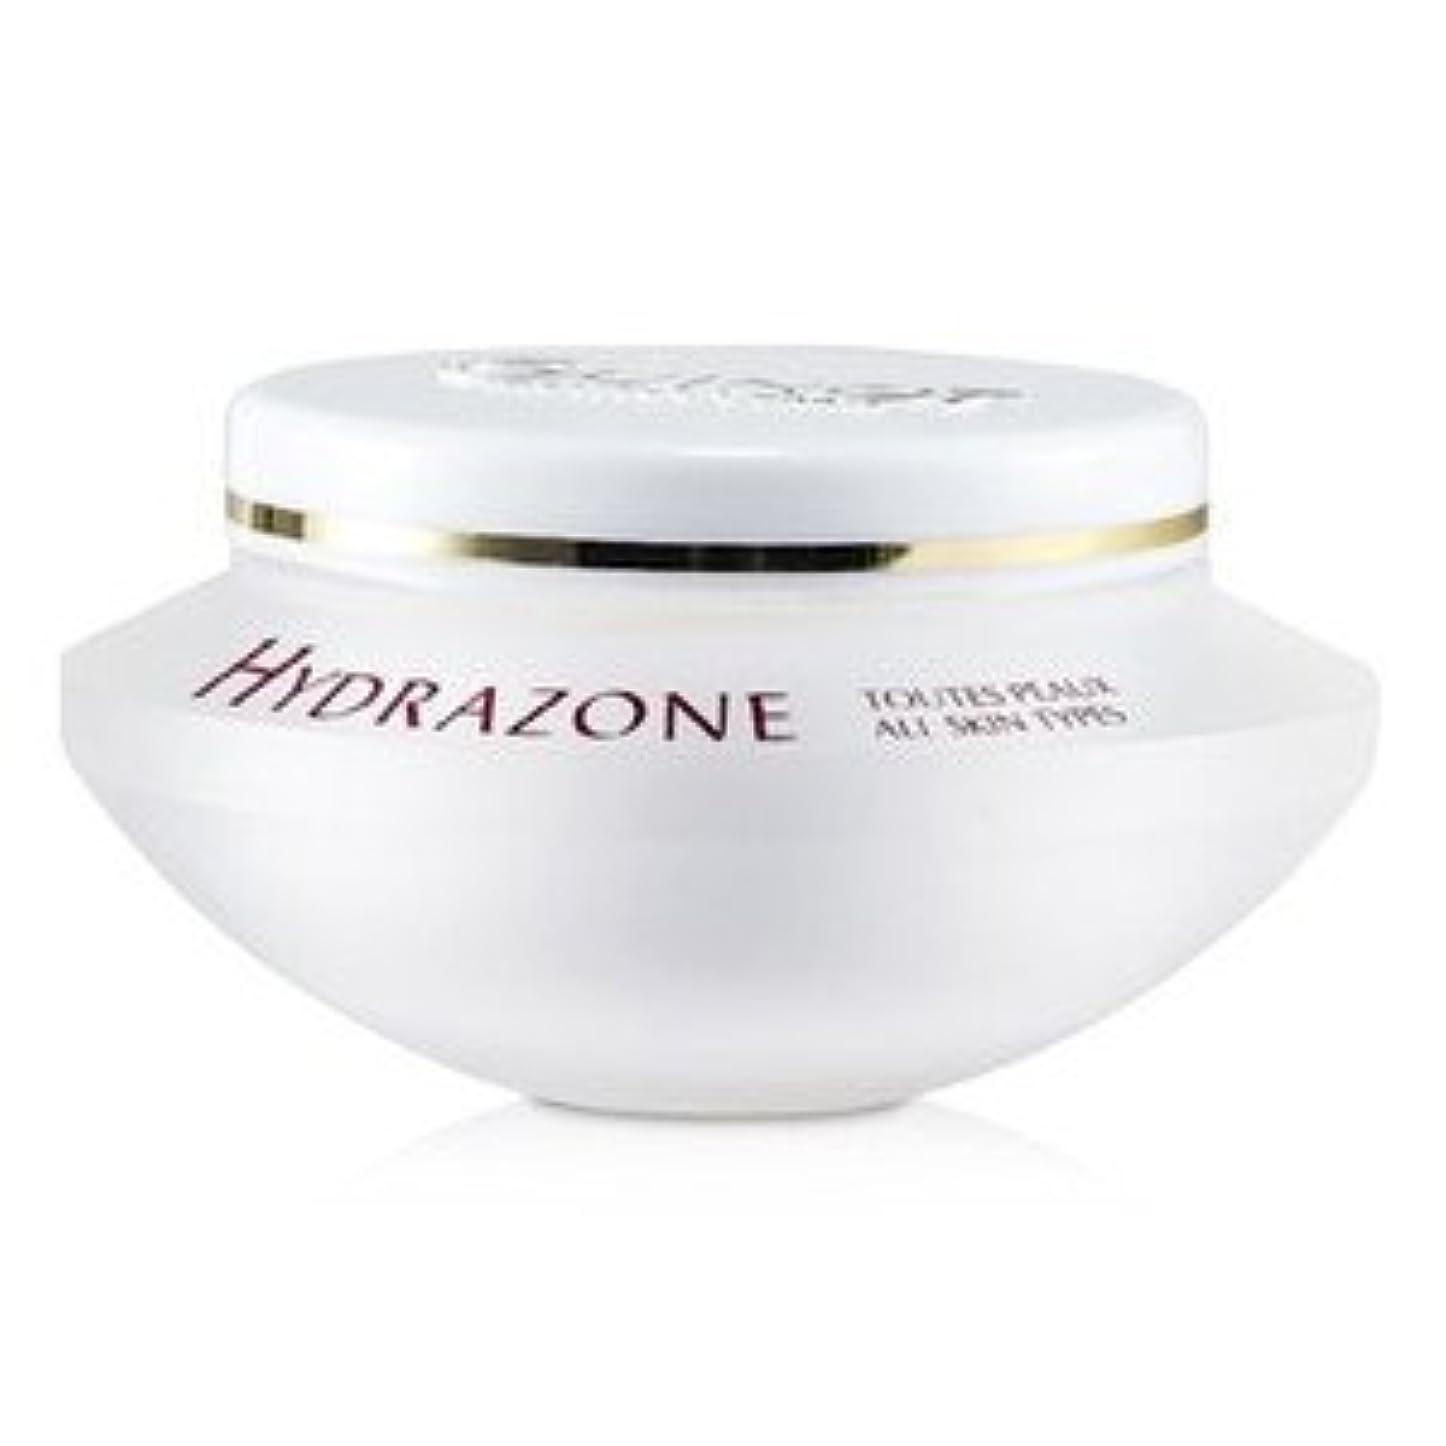 砦手首追記Guinot Hydrazone toutes peaux moisturizing cream all skin types [並行輸入品]